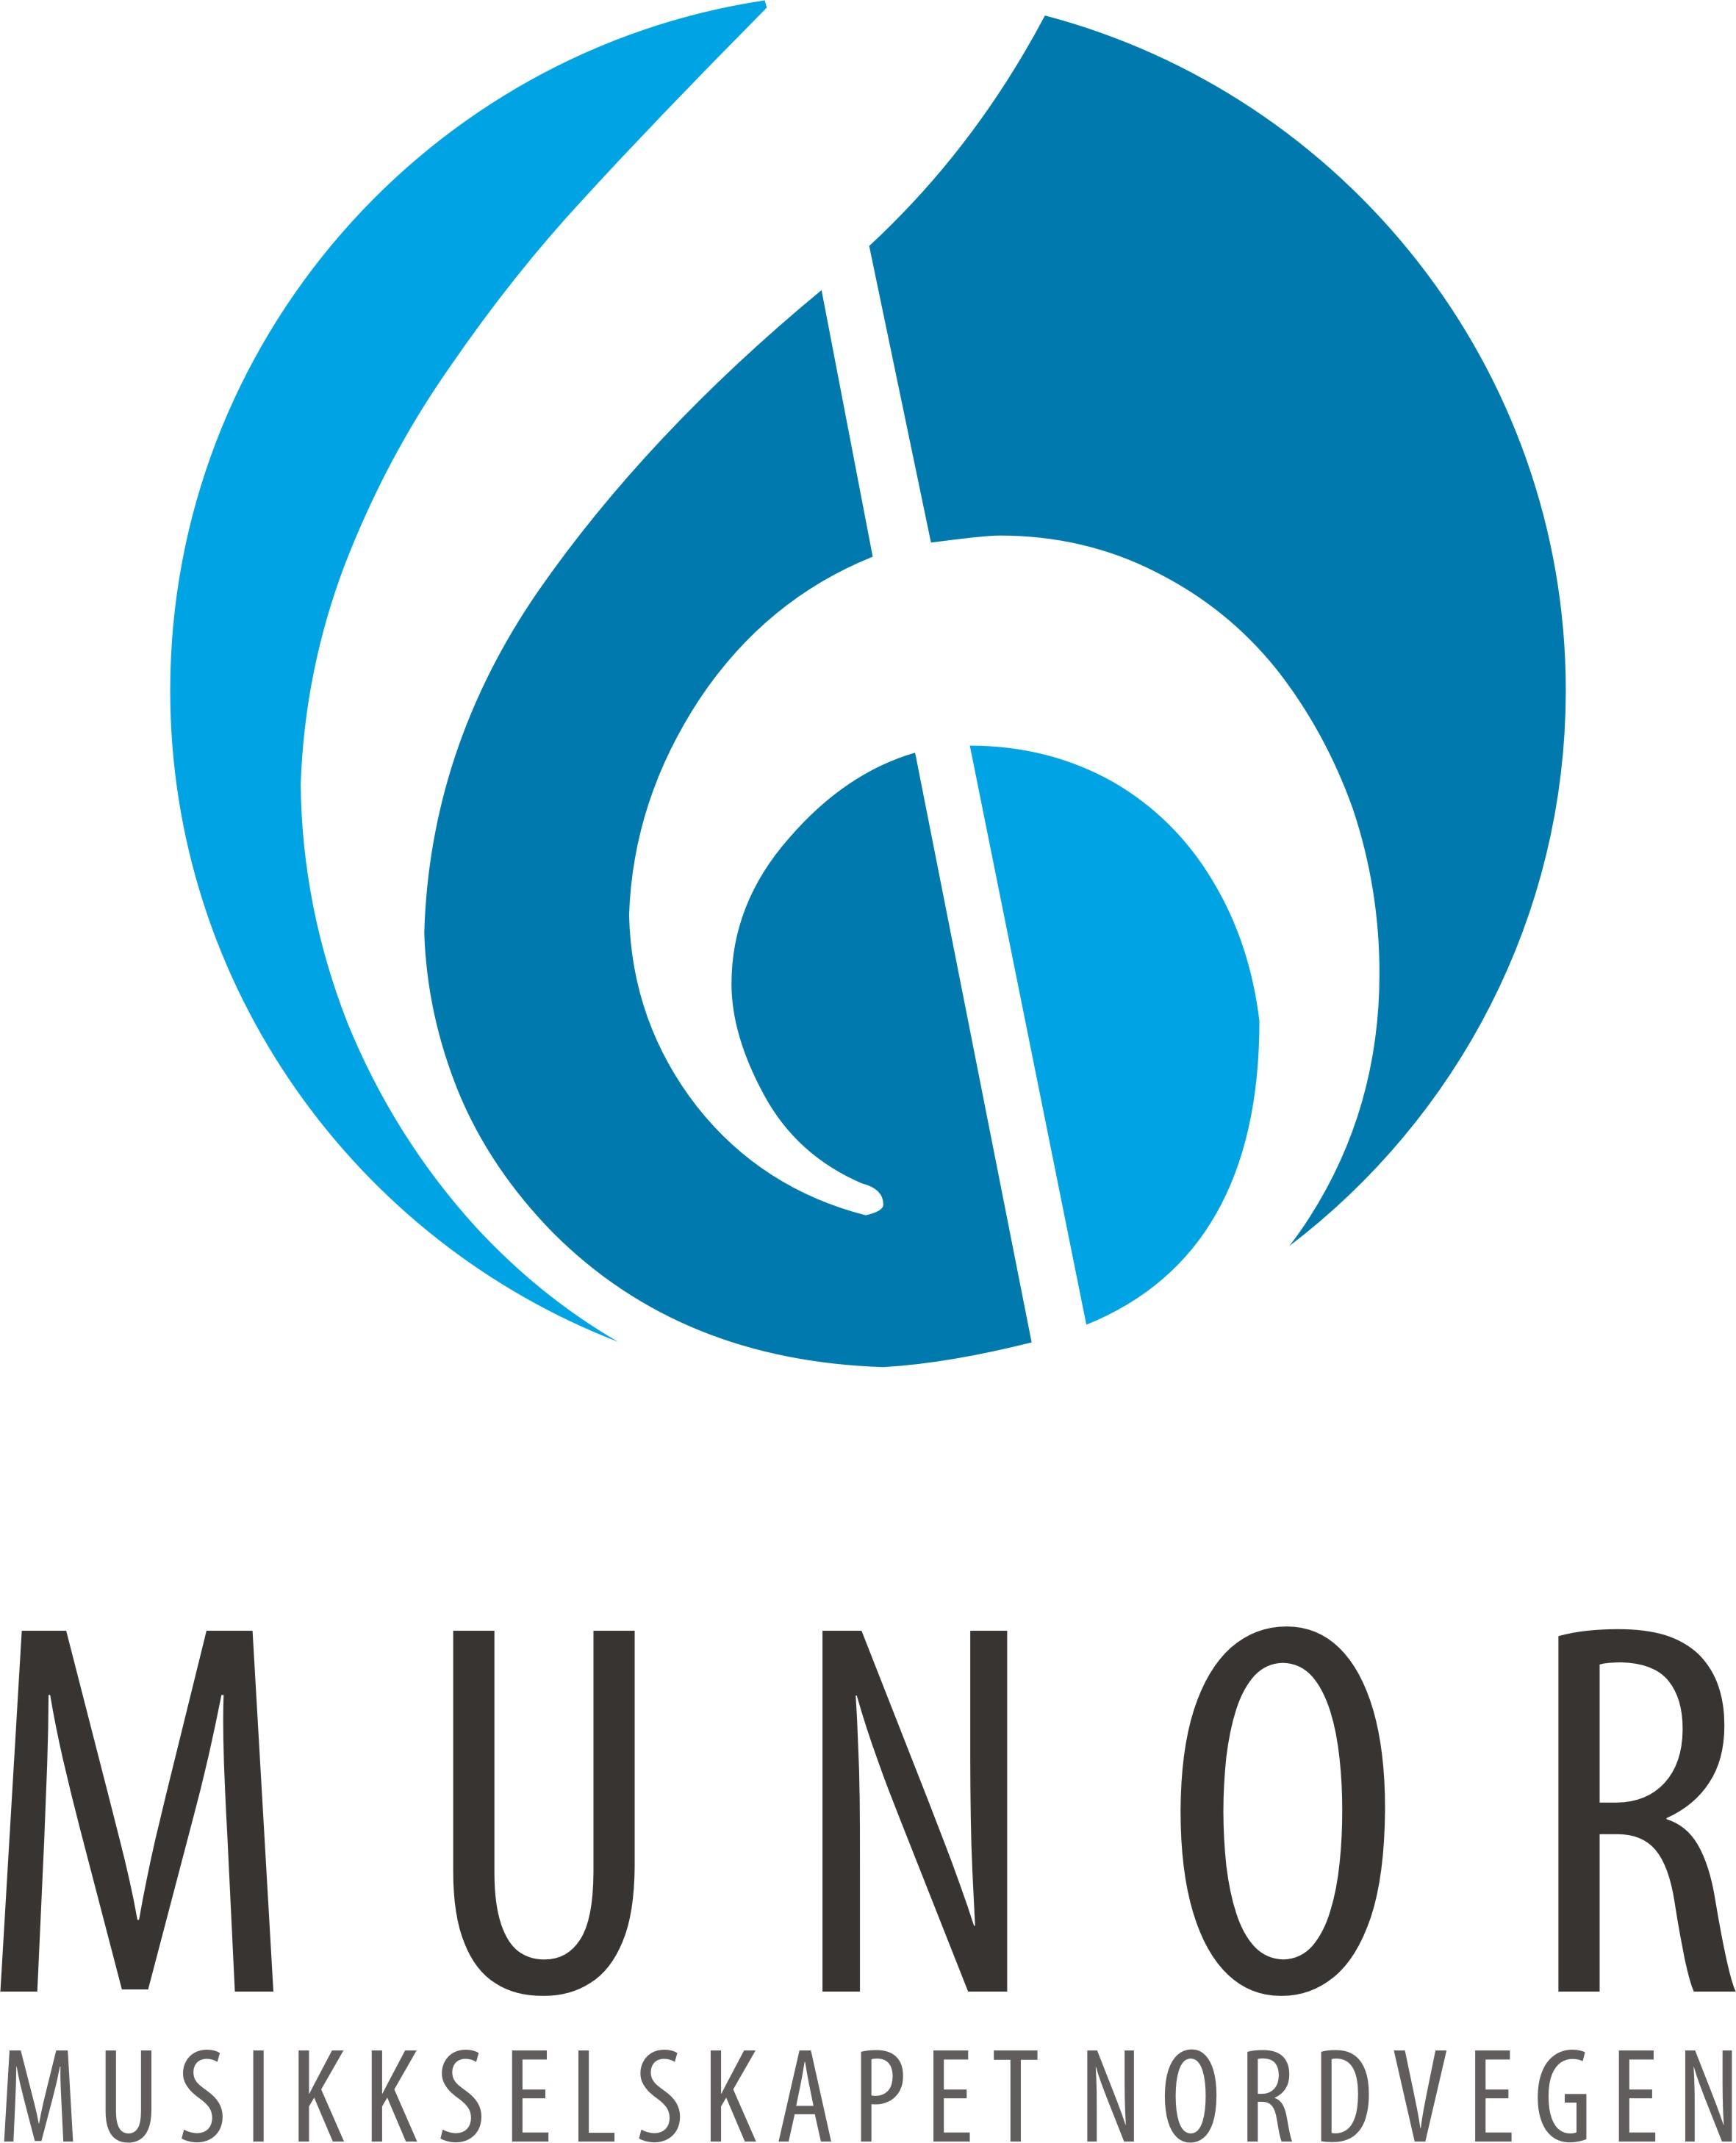 Munor logo hires 1